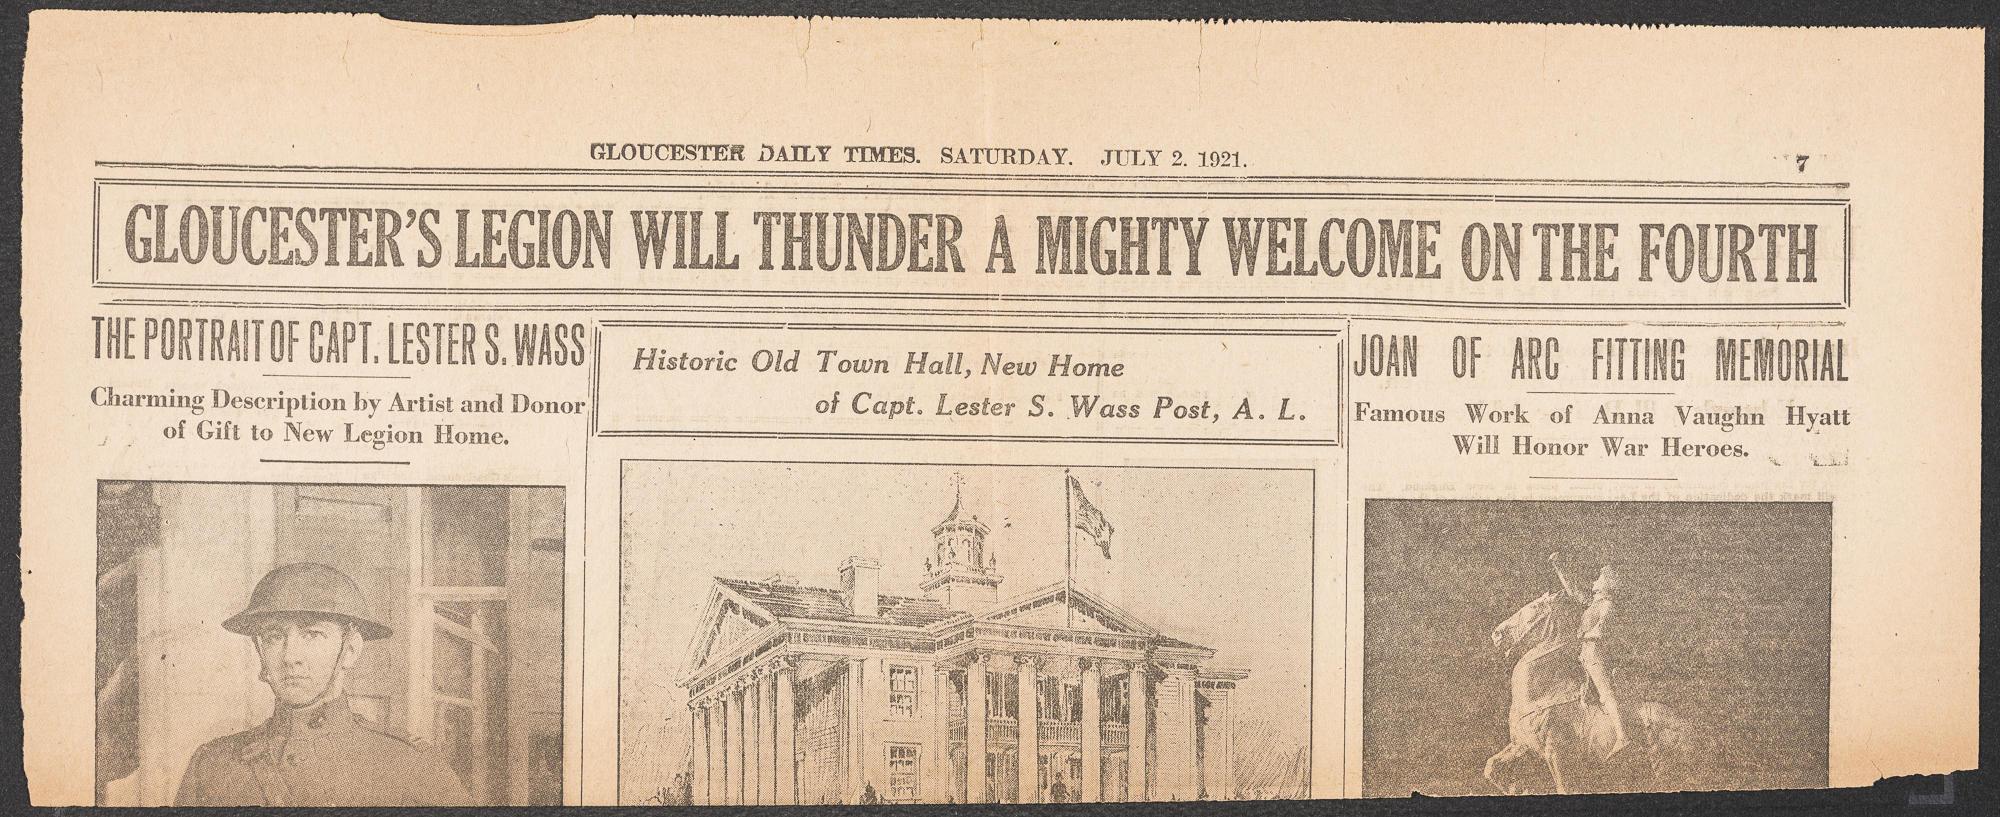 A headline on an old newspaper